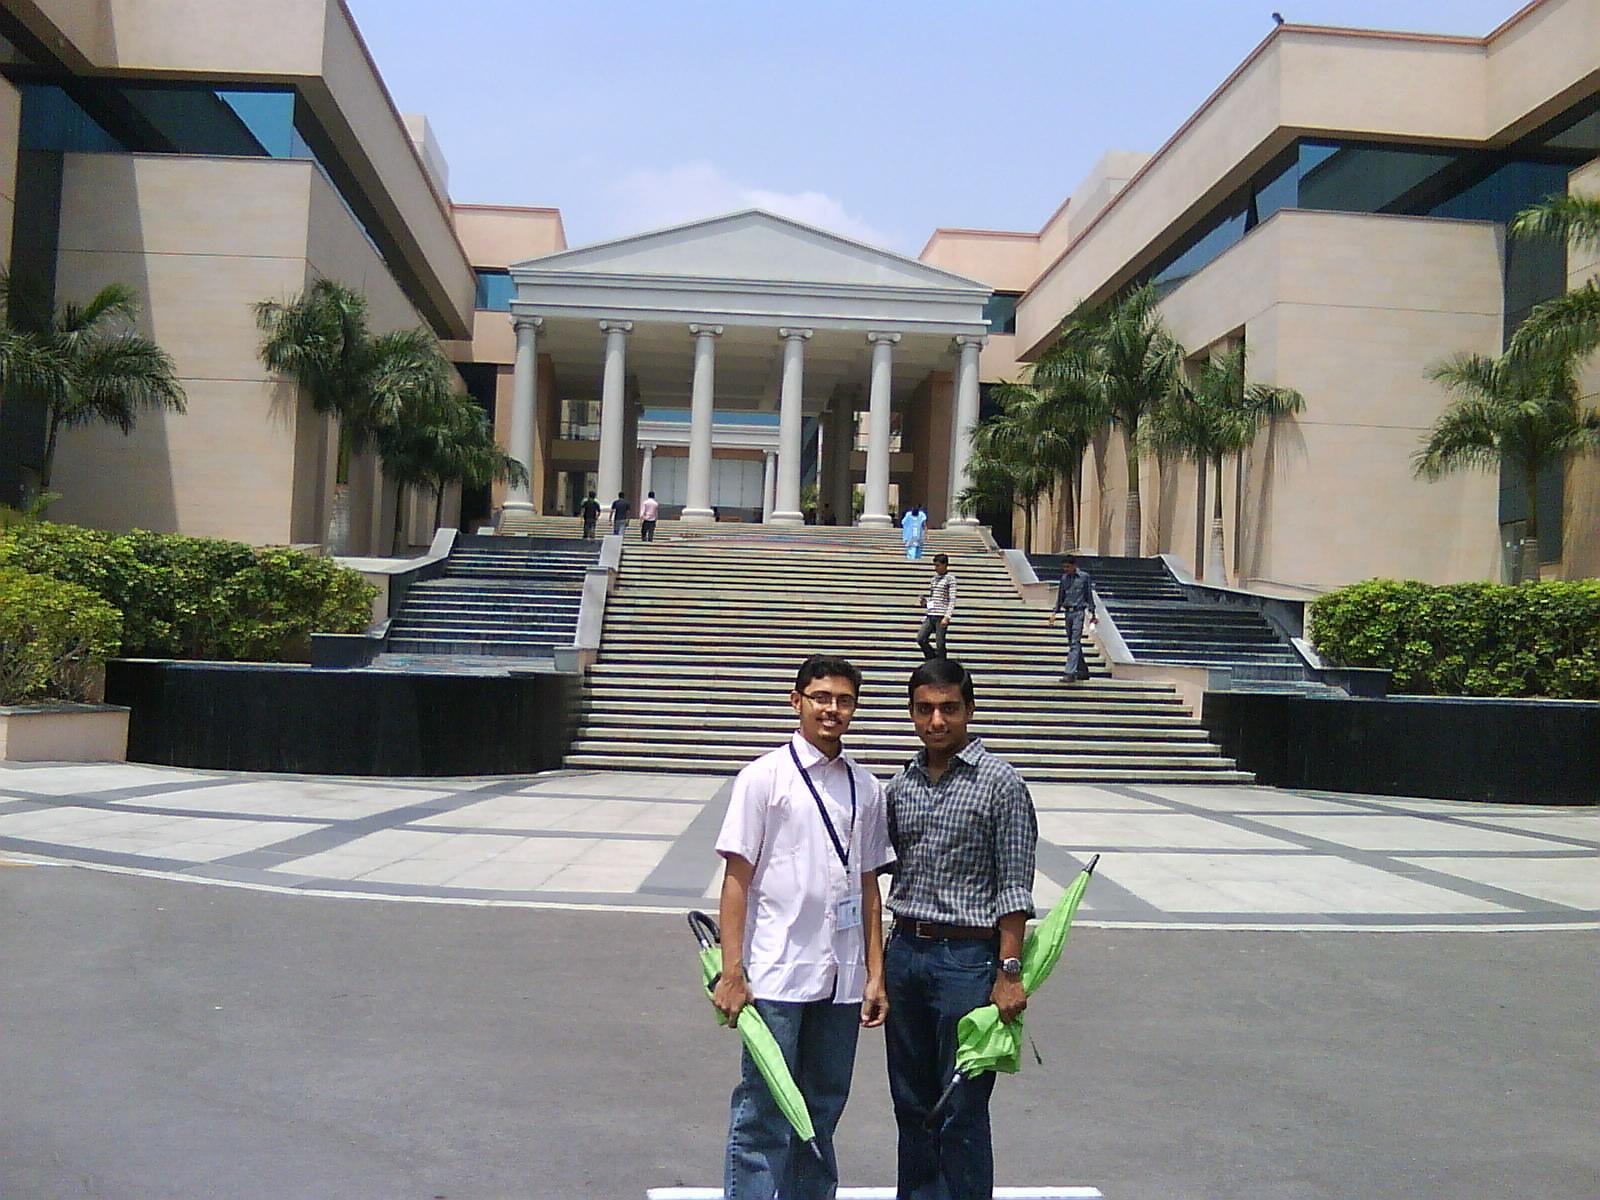 25+ Infosys Mysore Campus Address Pics - FreePix